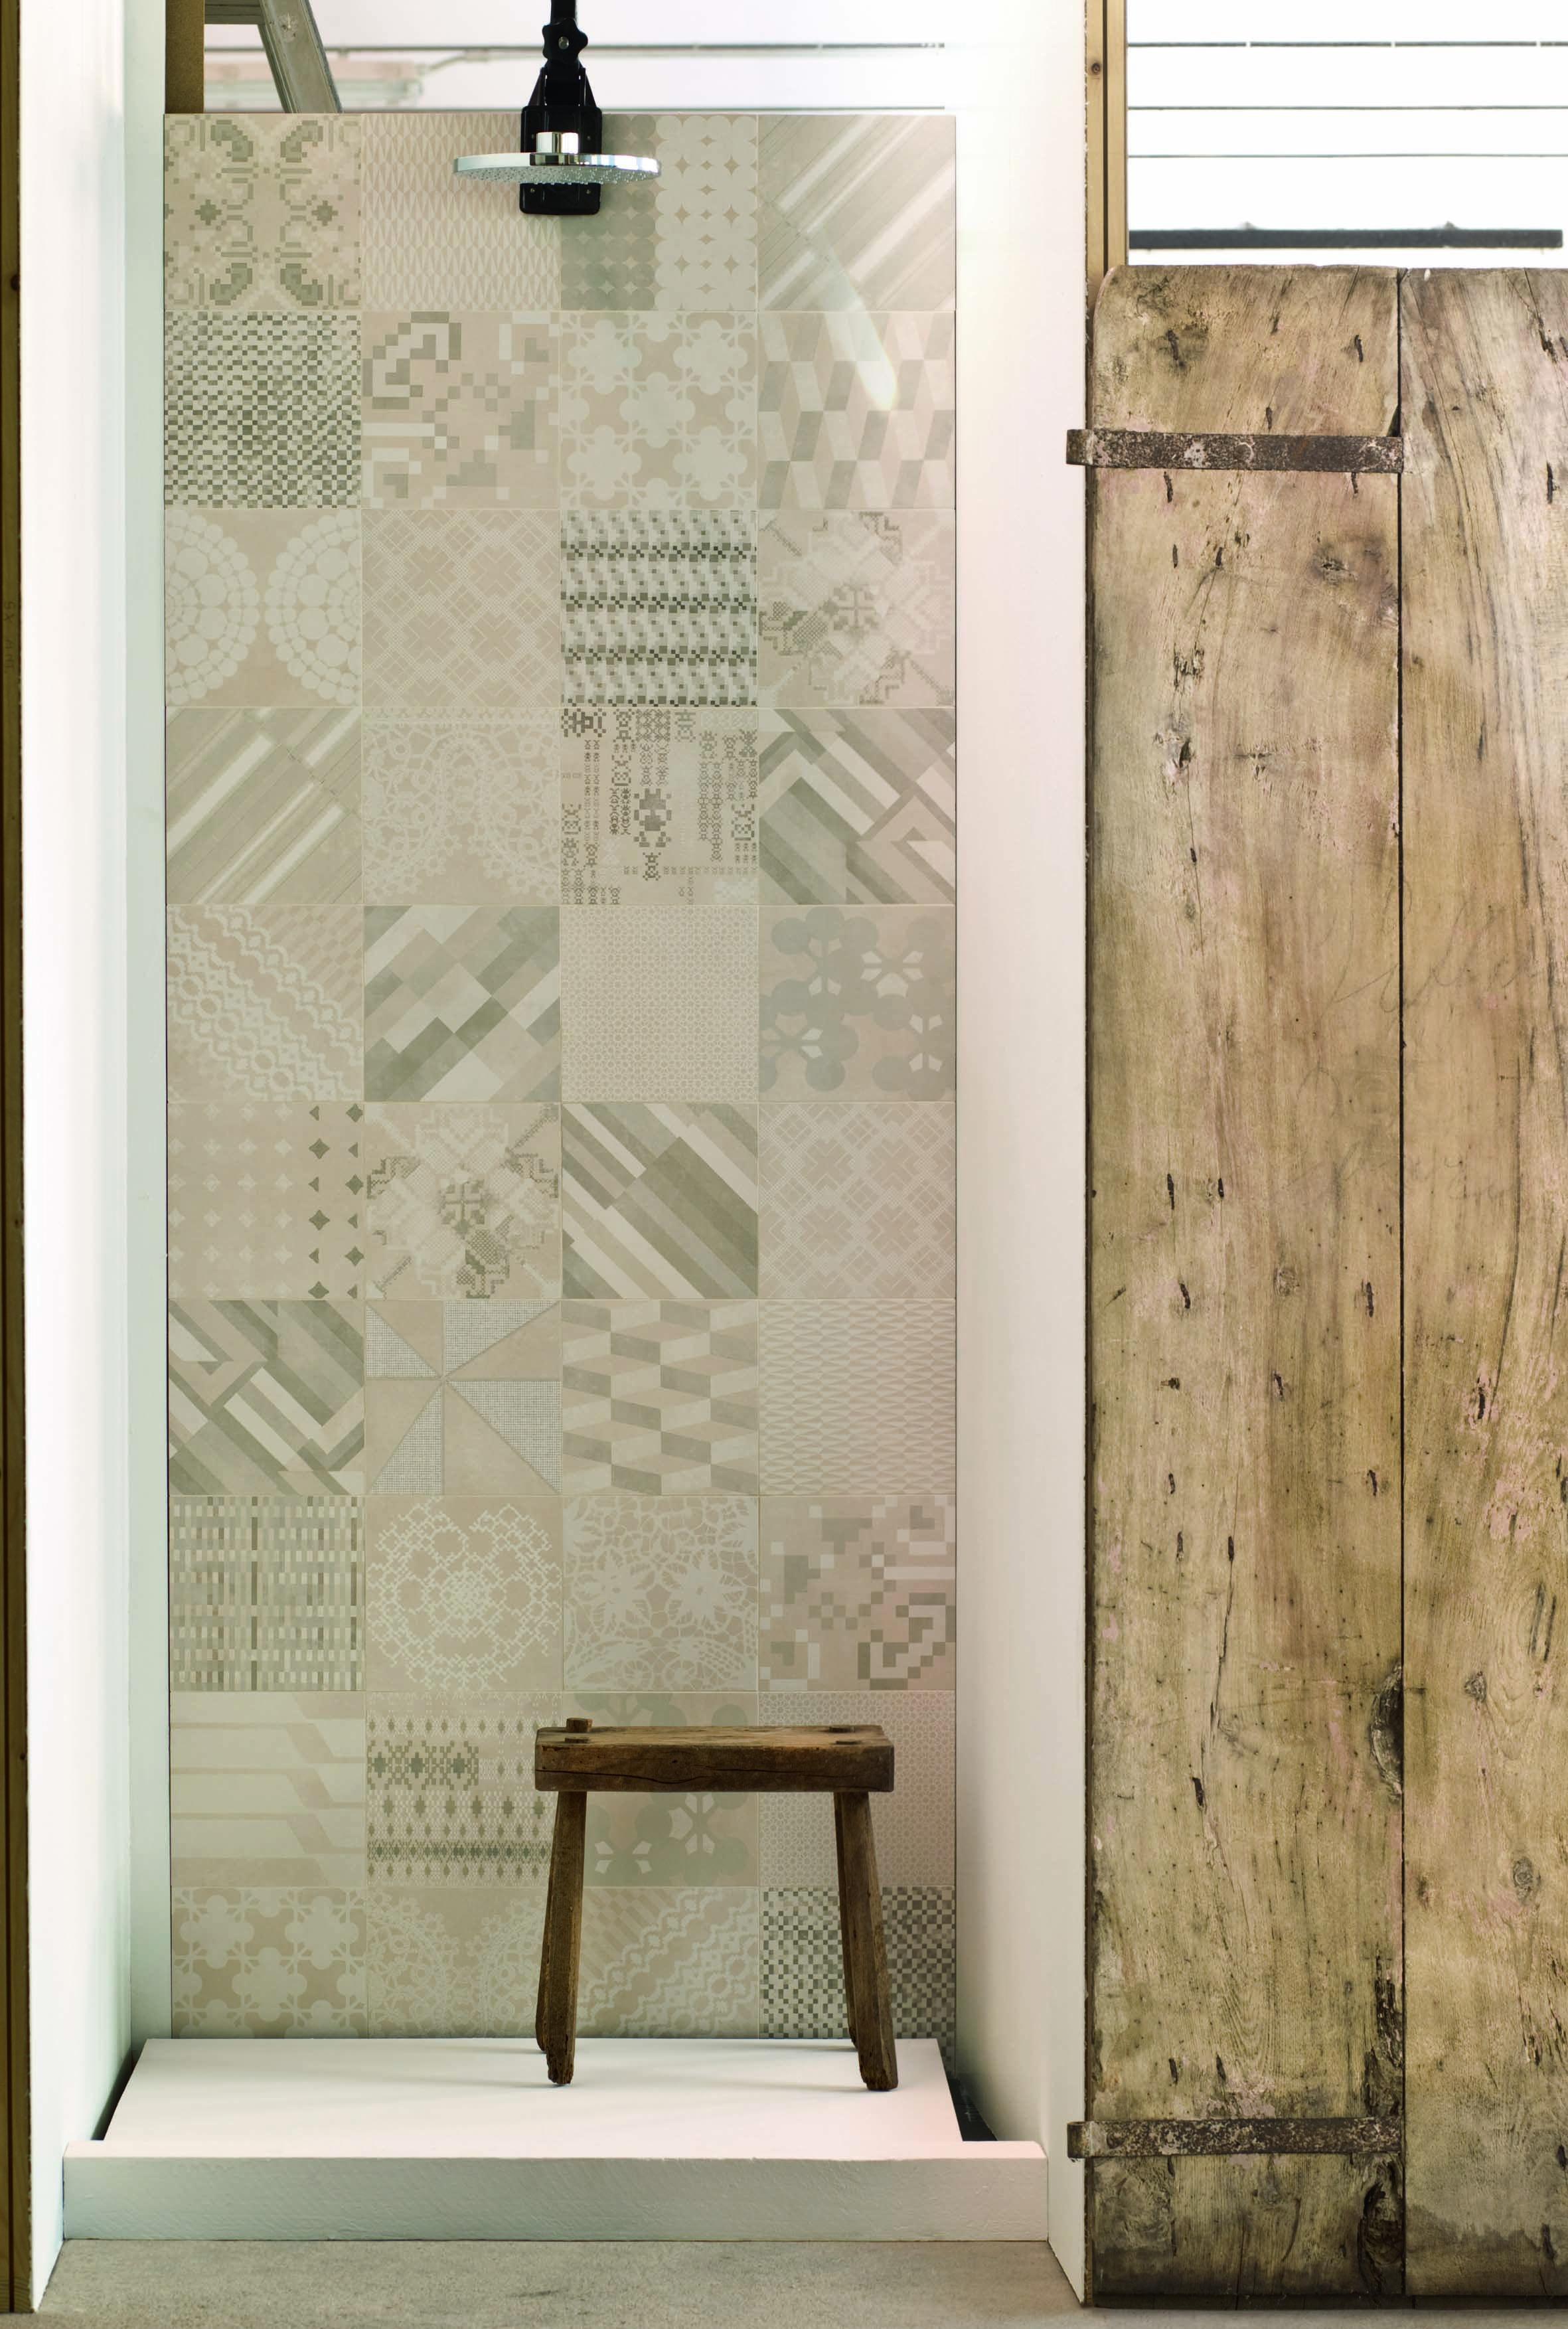 appealing bathroom decoration | Bathroom design ideas: Eye-catching tiles for a visually ...